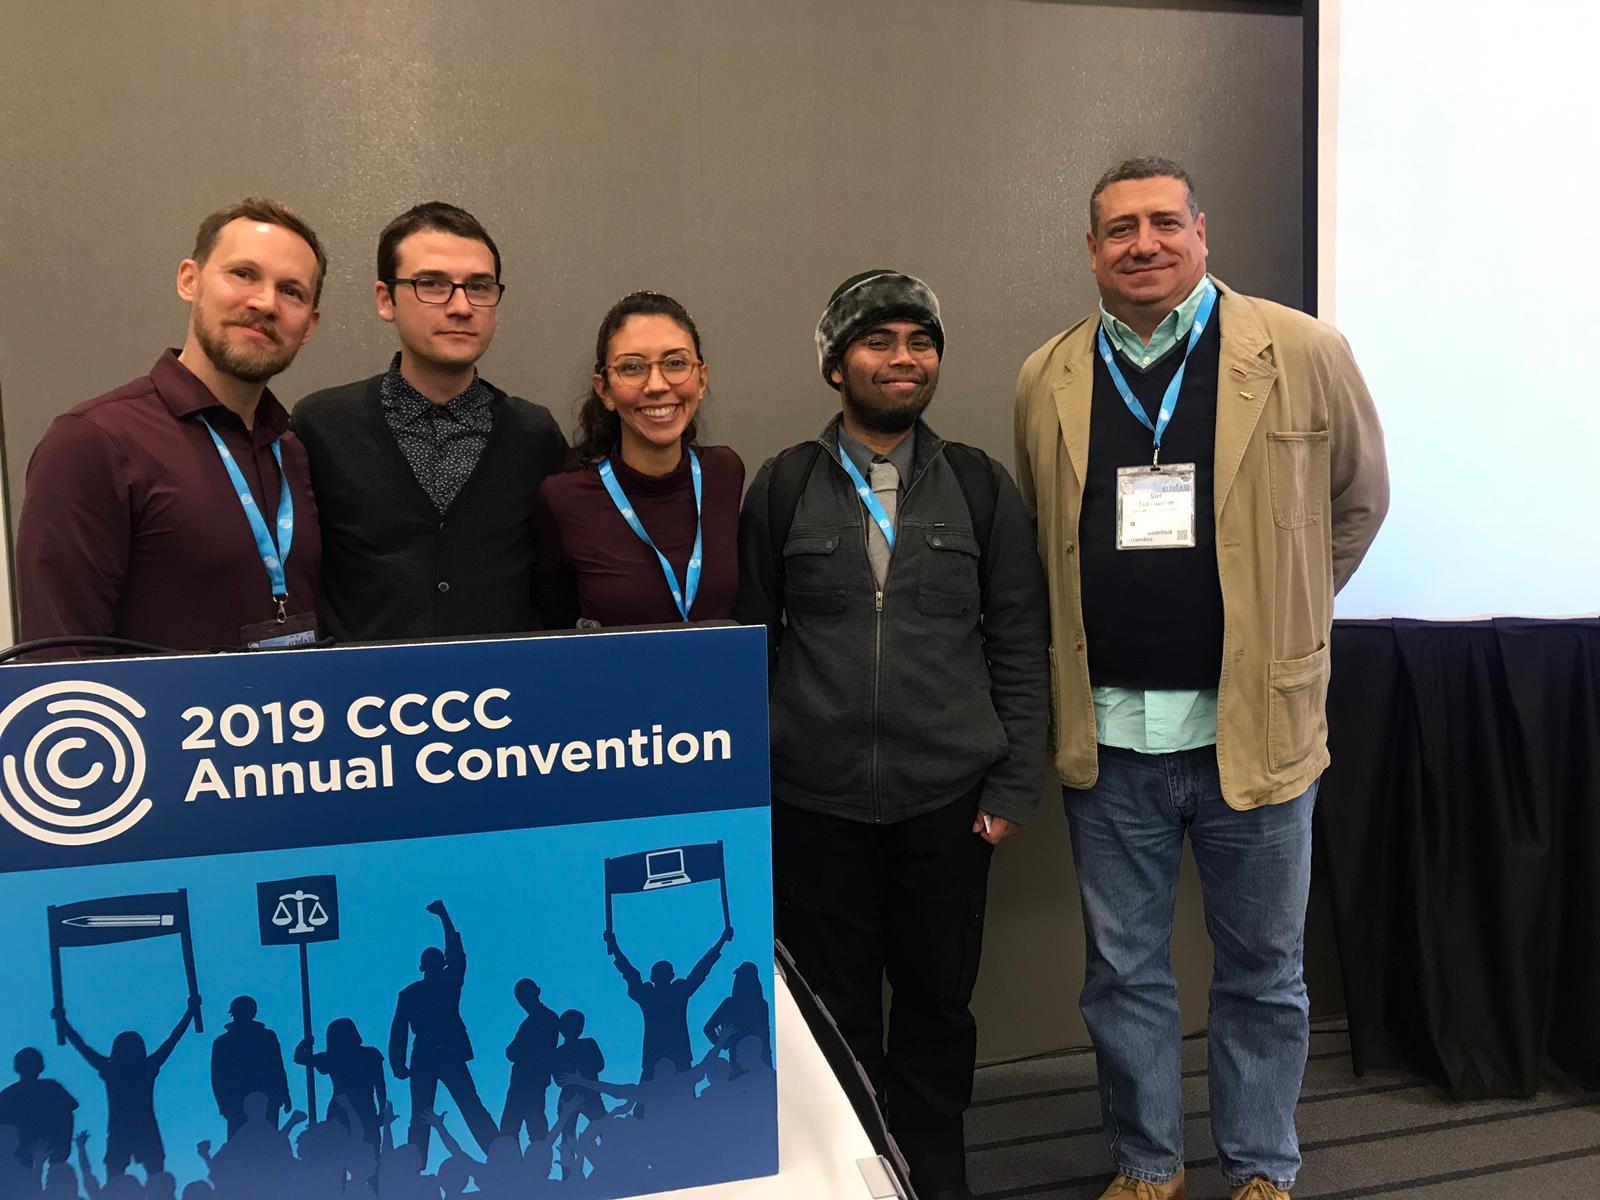 Jordan Hayes, Toma Peiu, Nelesi Rodriguez, Al Harahap, Sid Dobrin - Pittsburgh, PA, March 14th, 2019